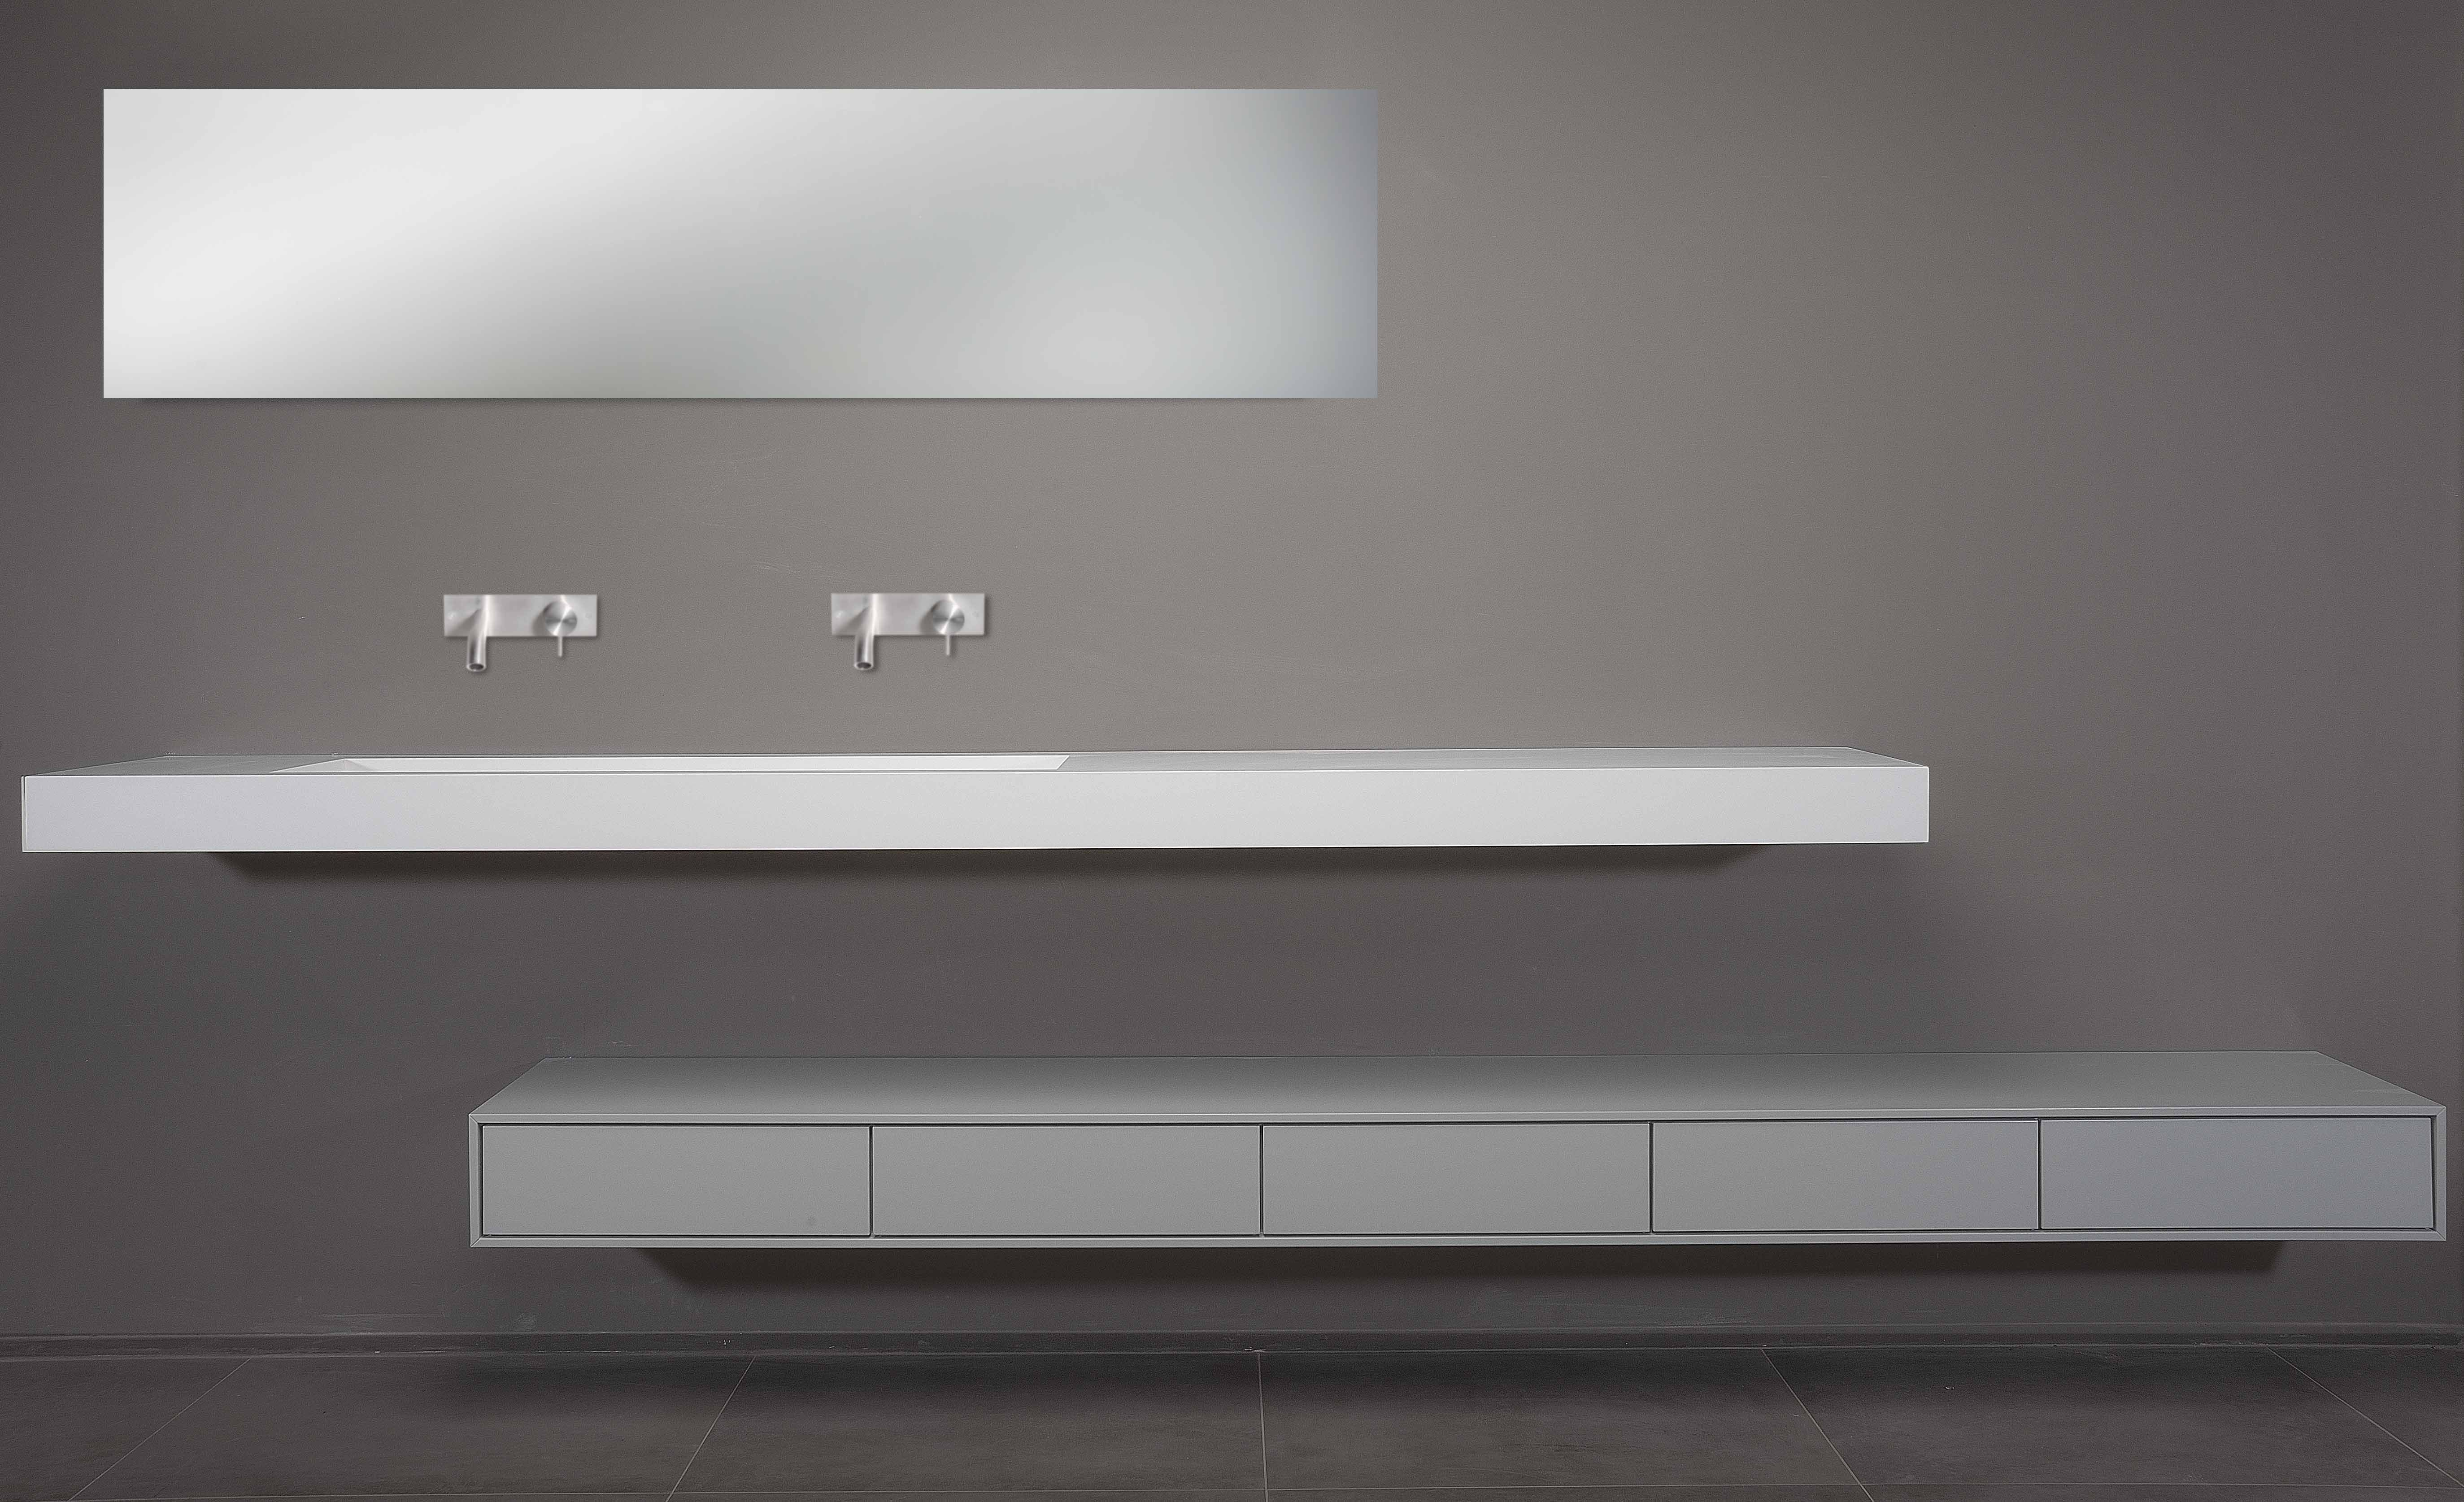 Opbergkast Voor Badkamer : Badkamer kast nl badkamer hoge kast